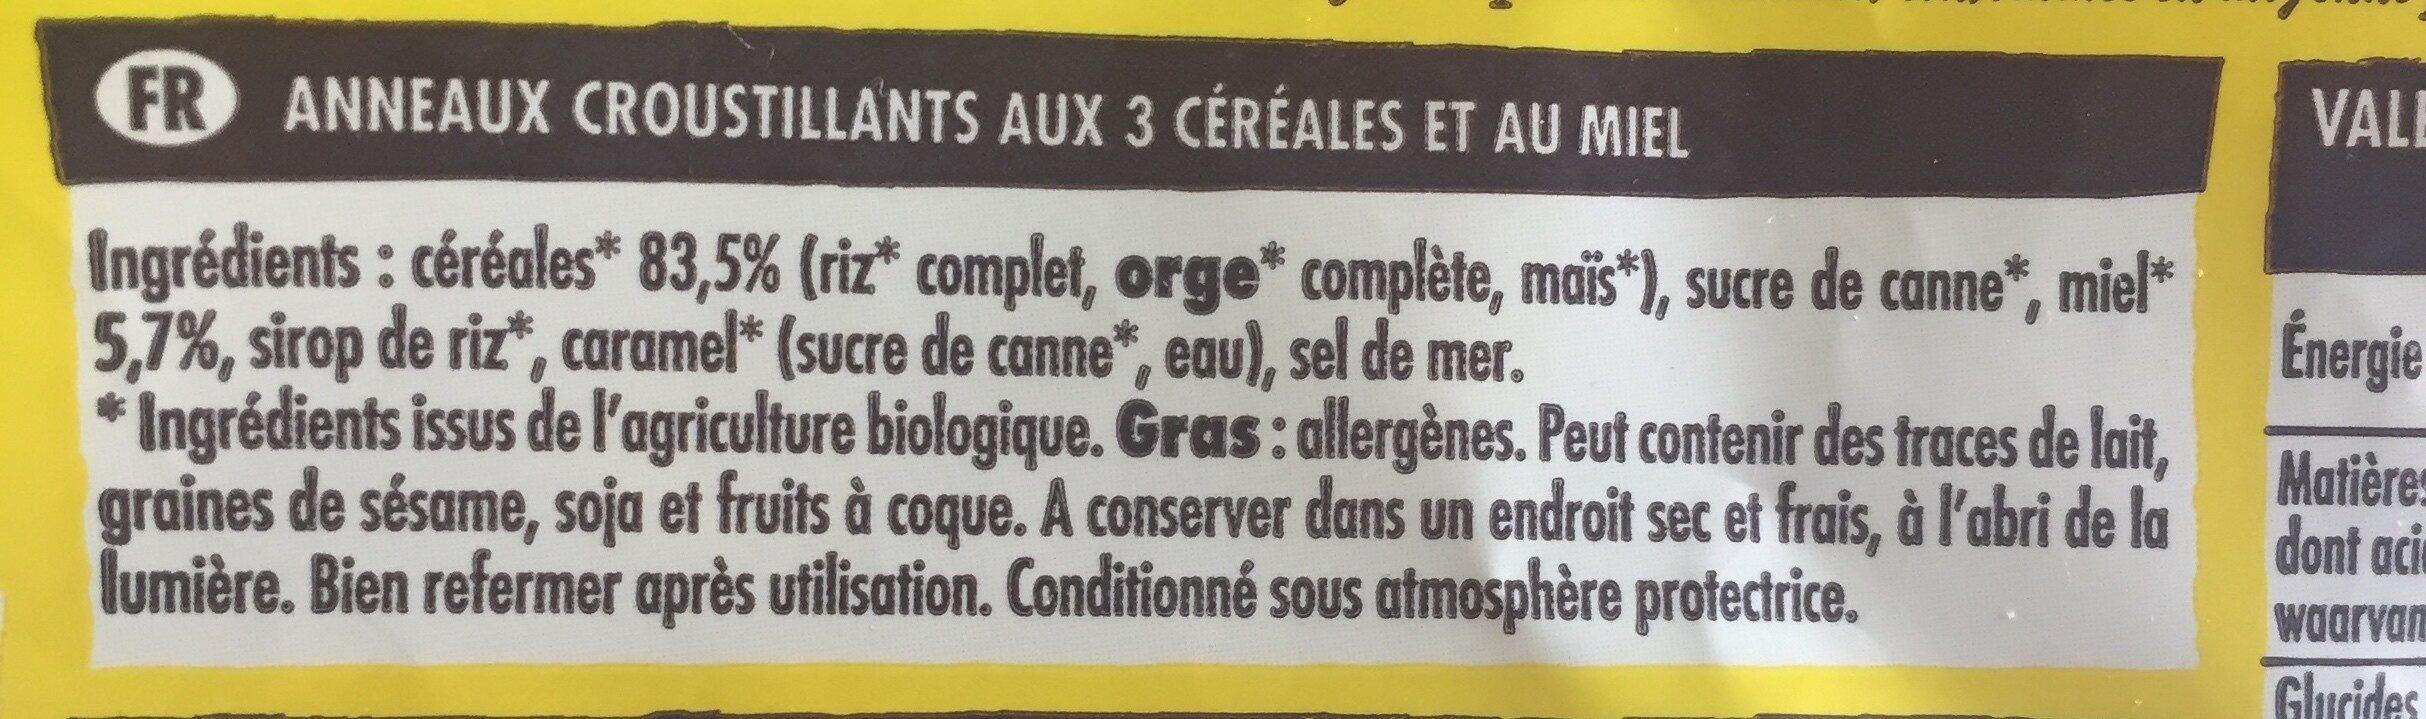 Crosti Oz Miel - Ingrédients